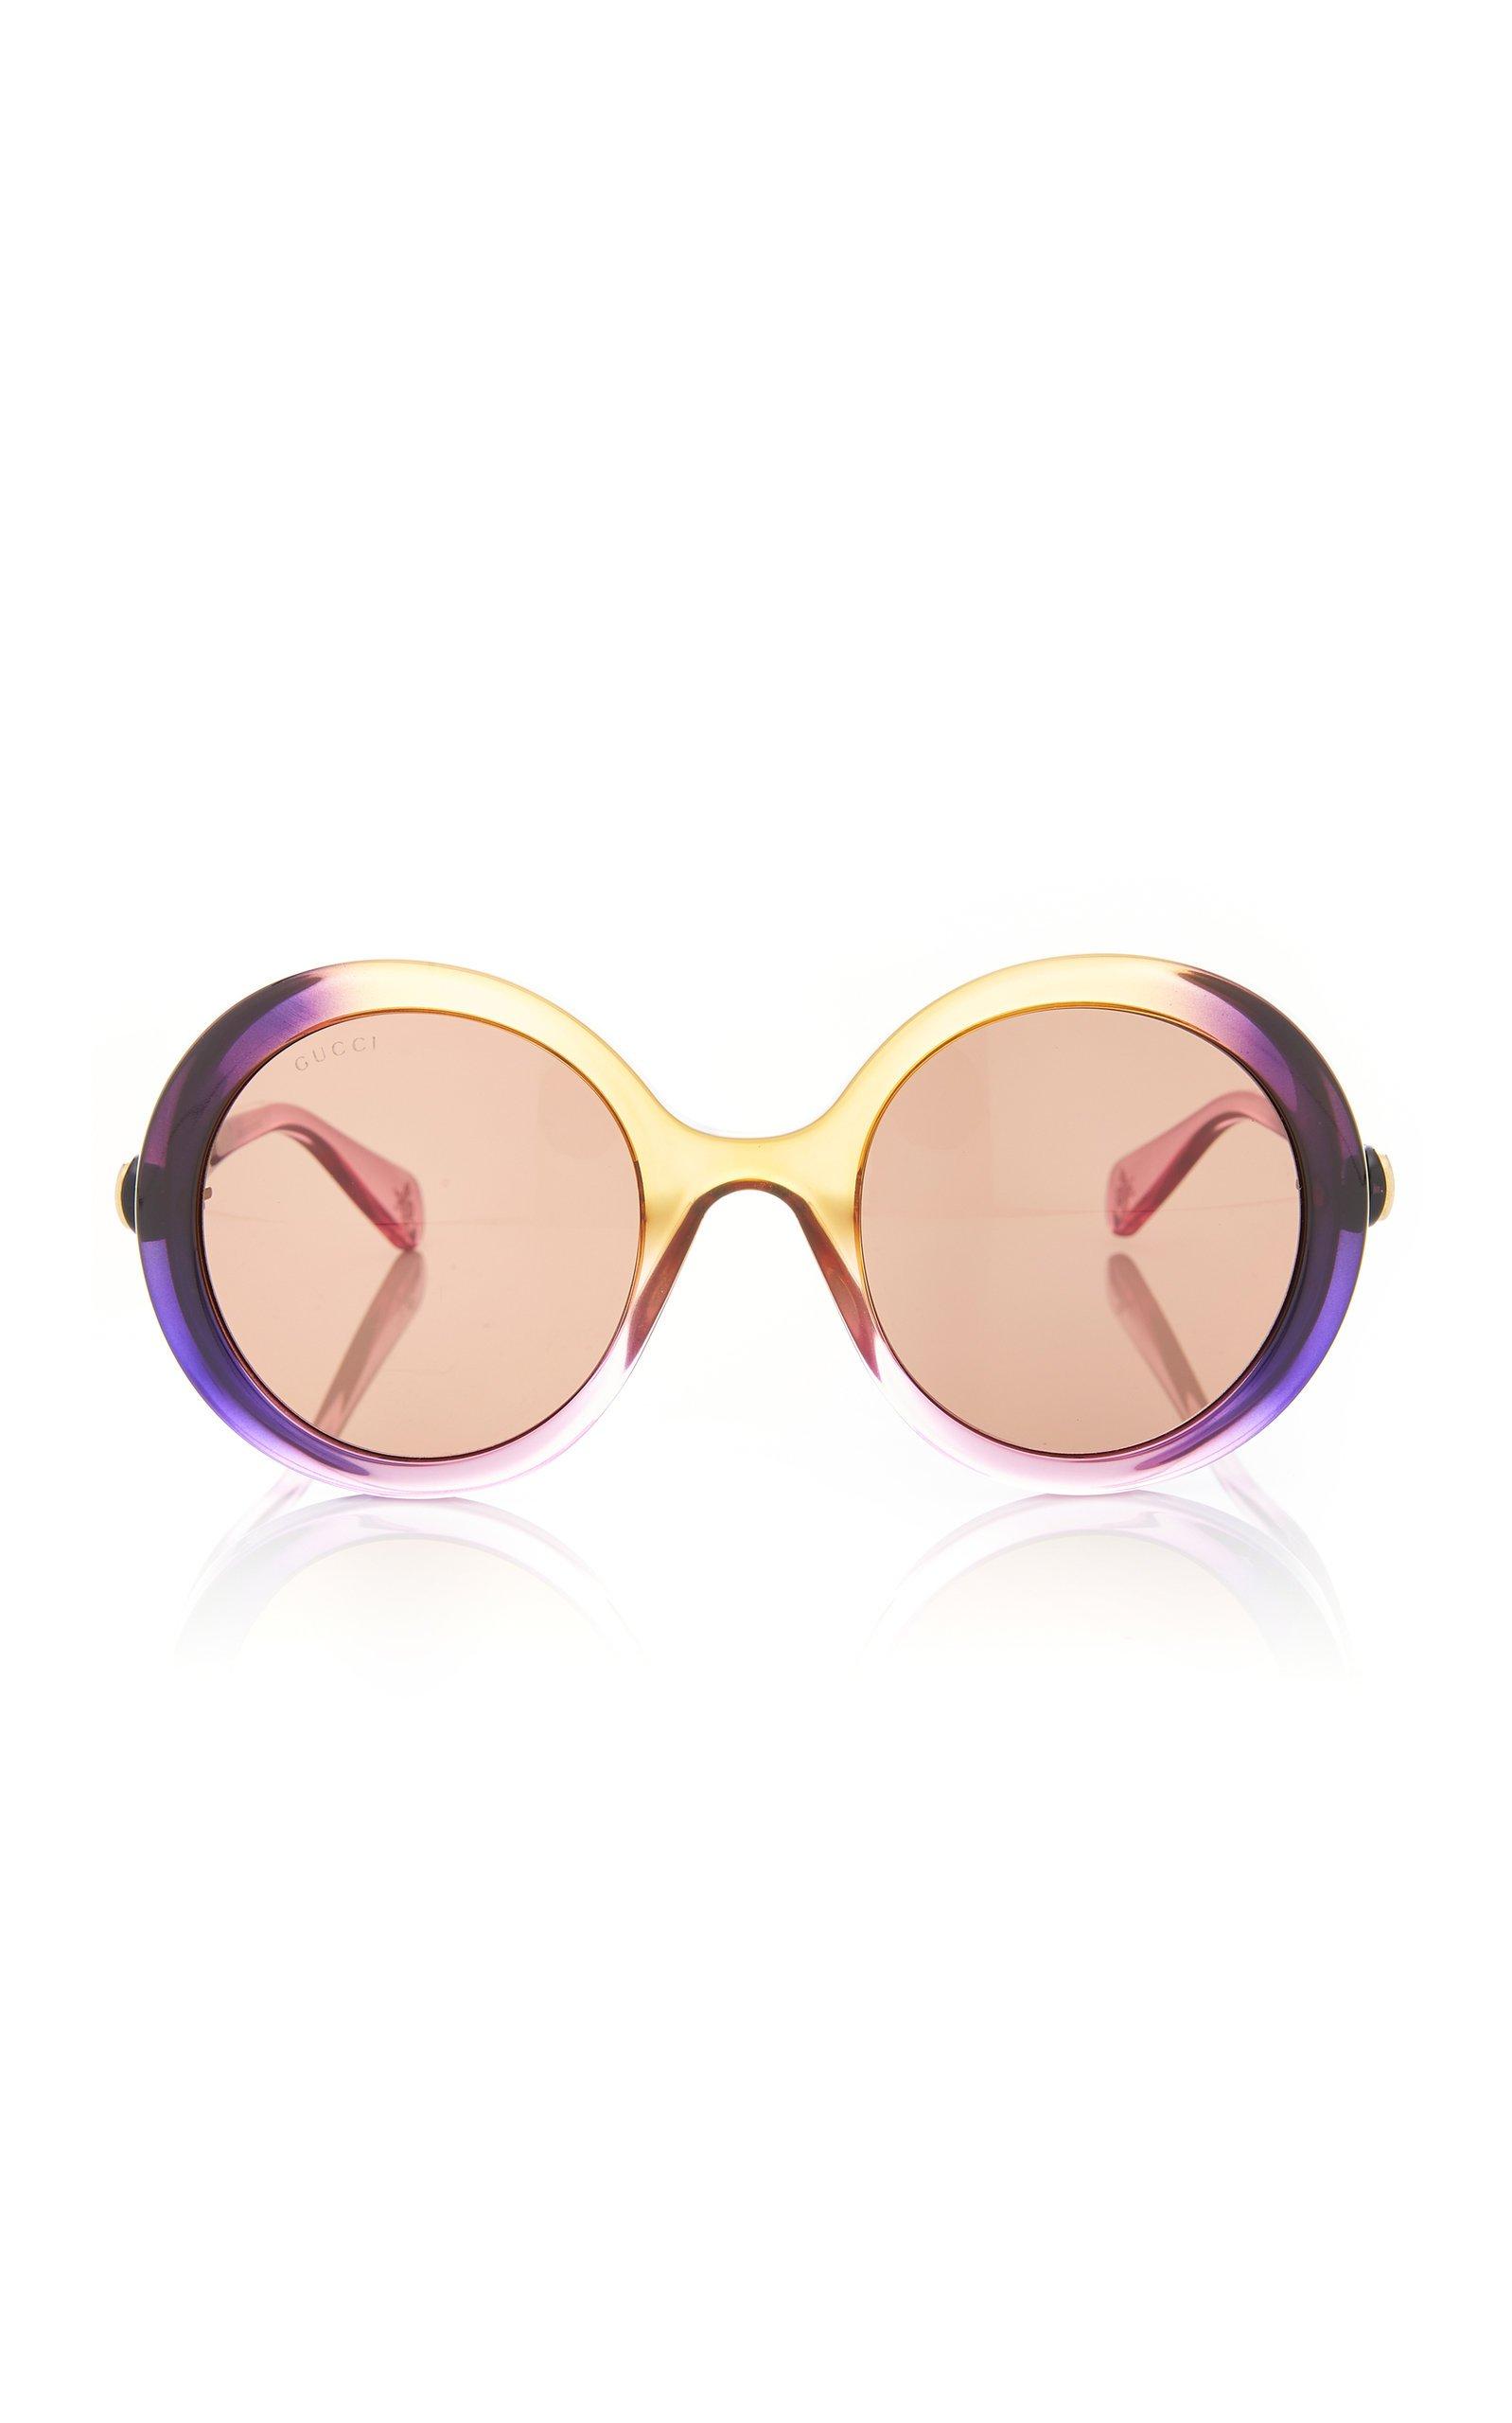 Gucci Sunglasses Gradient Glamorous Sunglasses